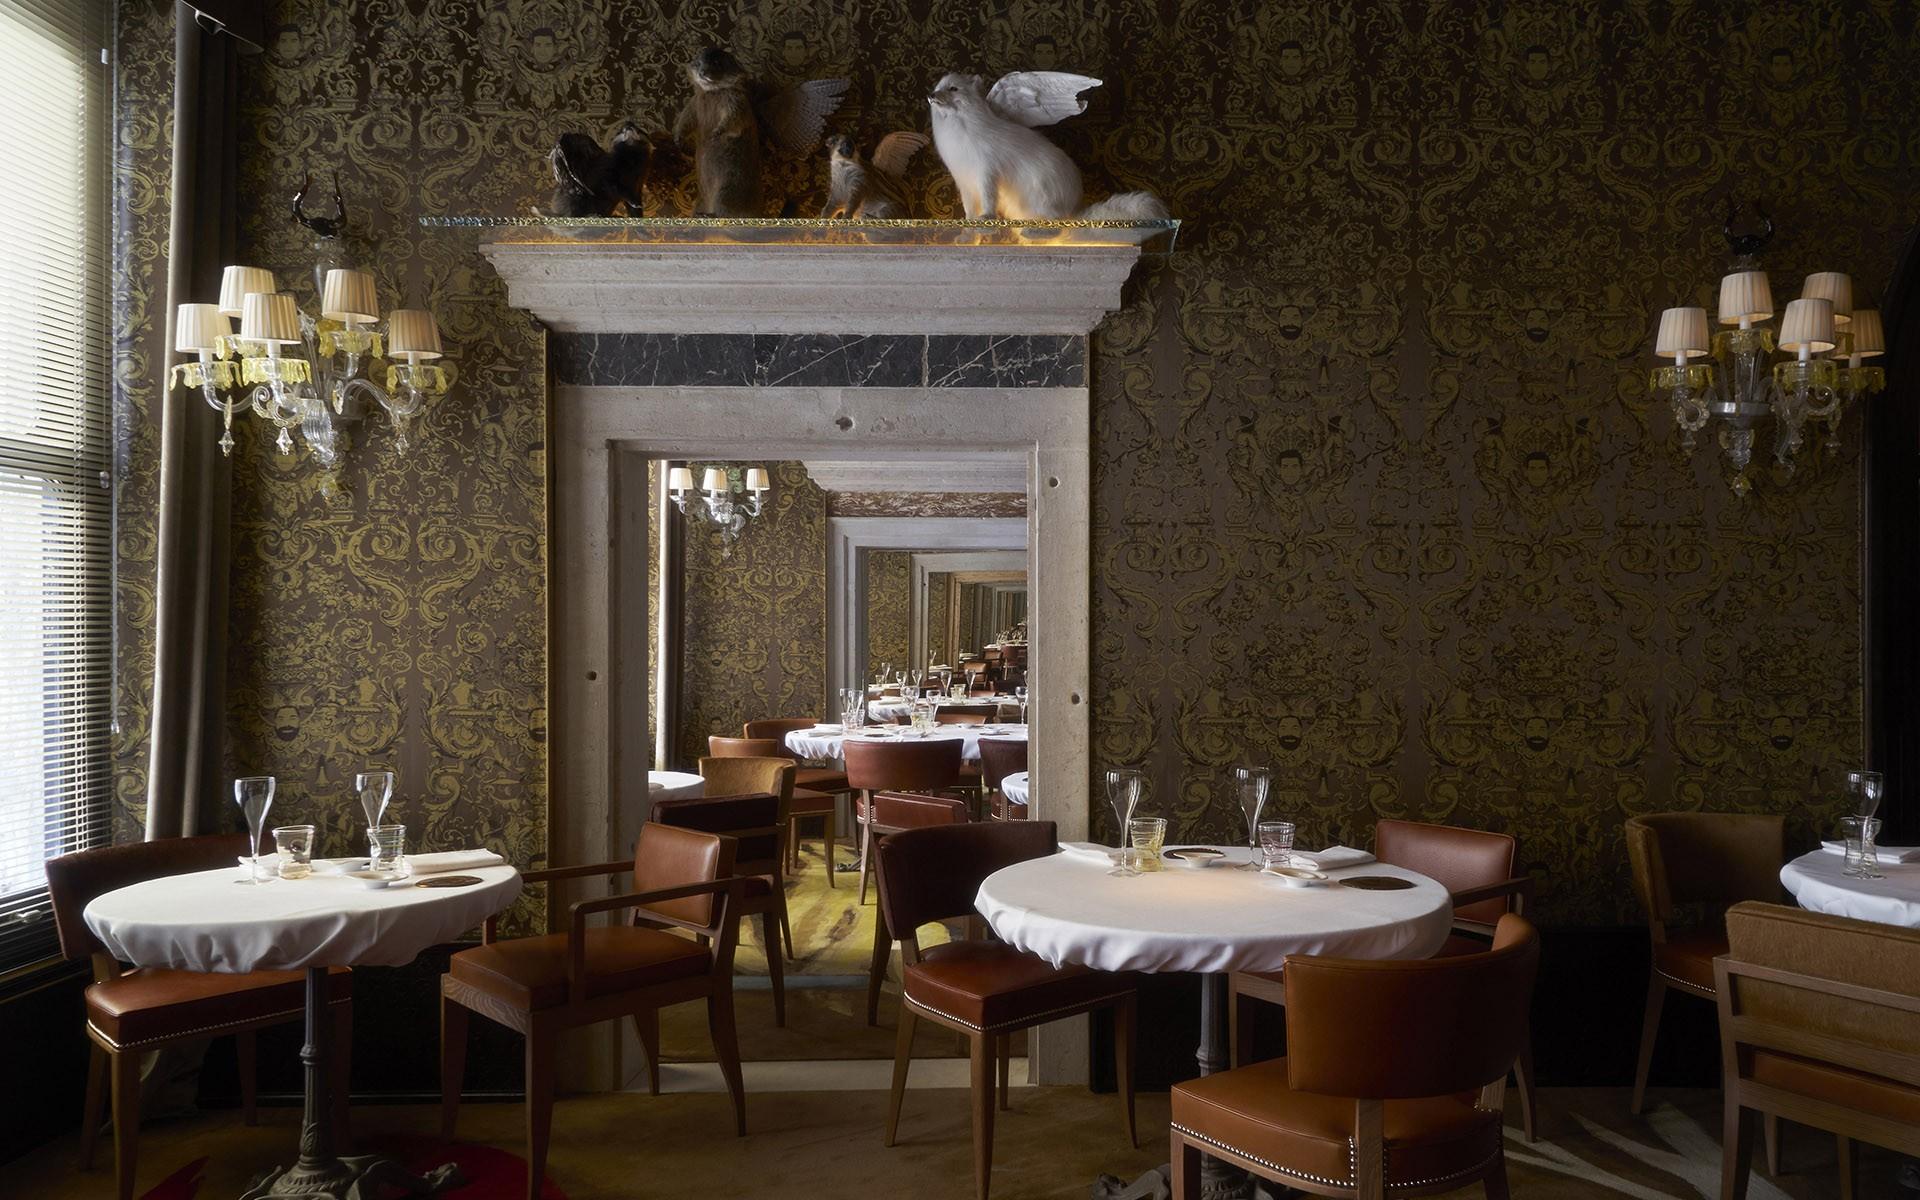 sala con tavoli ristorante Ristorante Quadri